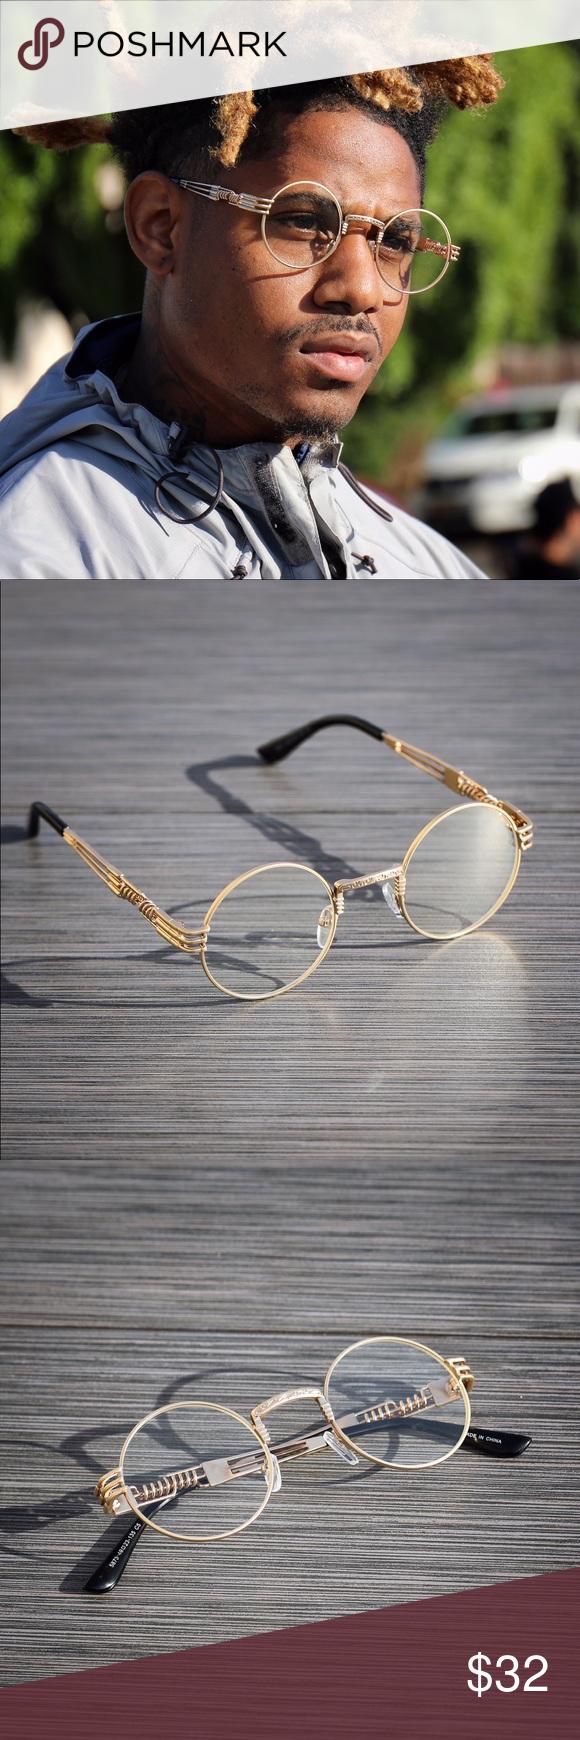 Retro Vintage Style Double Rim Round Dad Eyeglasses